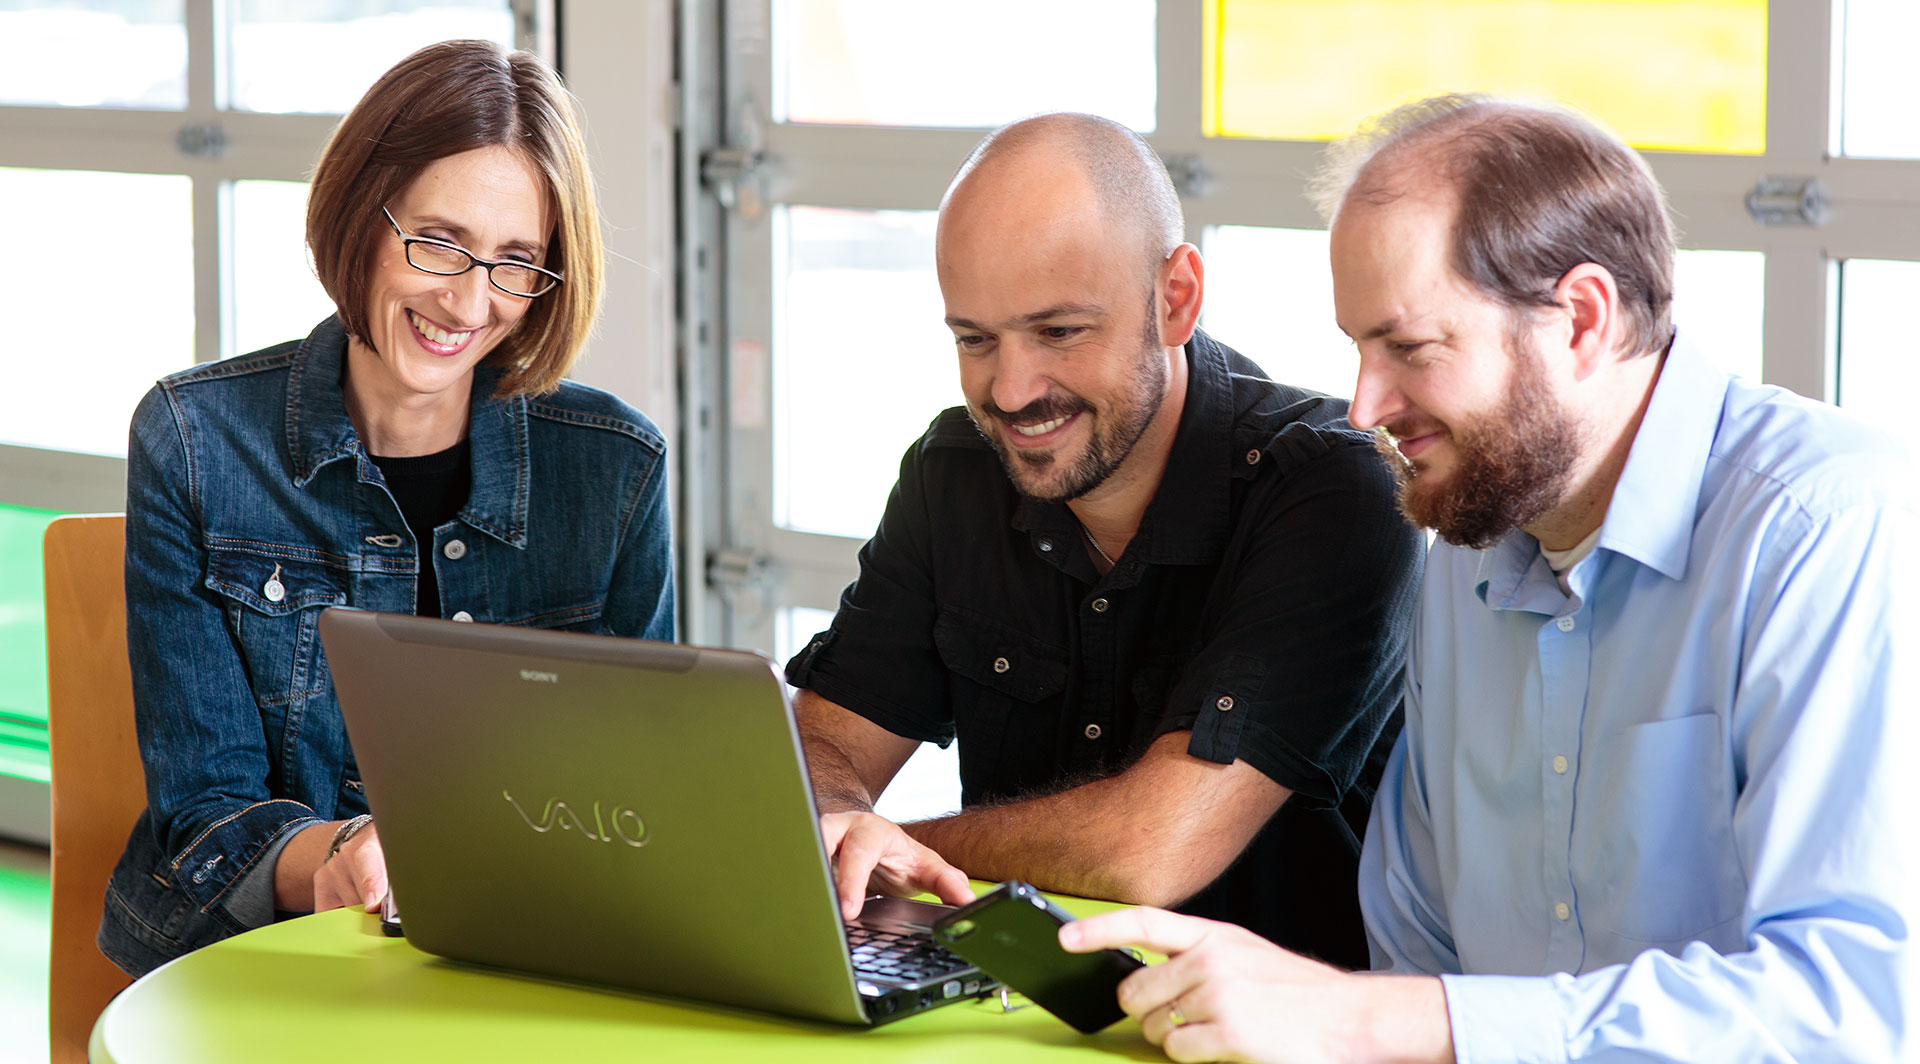 Gerda Breaux, Eric Wargo and Joseph Dispensa work at the office of Sneaker Web Design, also located in Zurich, Switzerland.